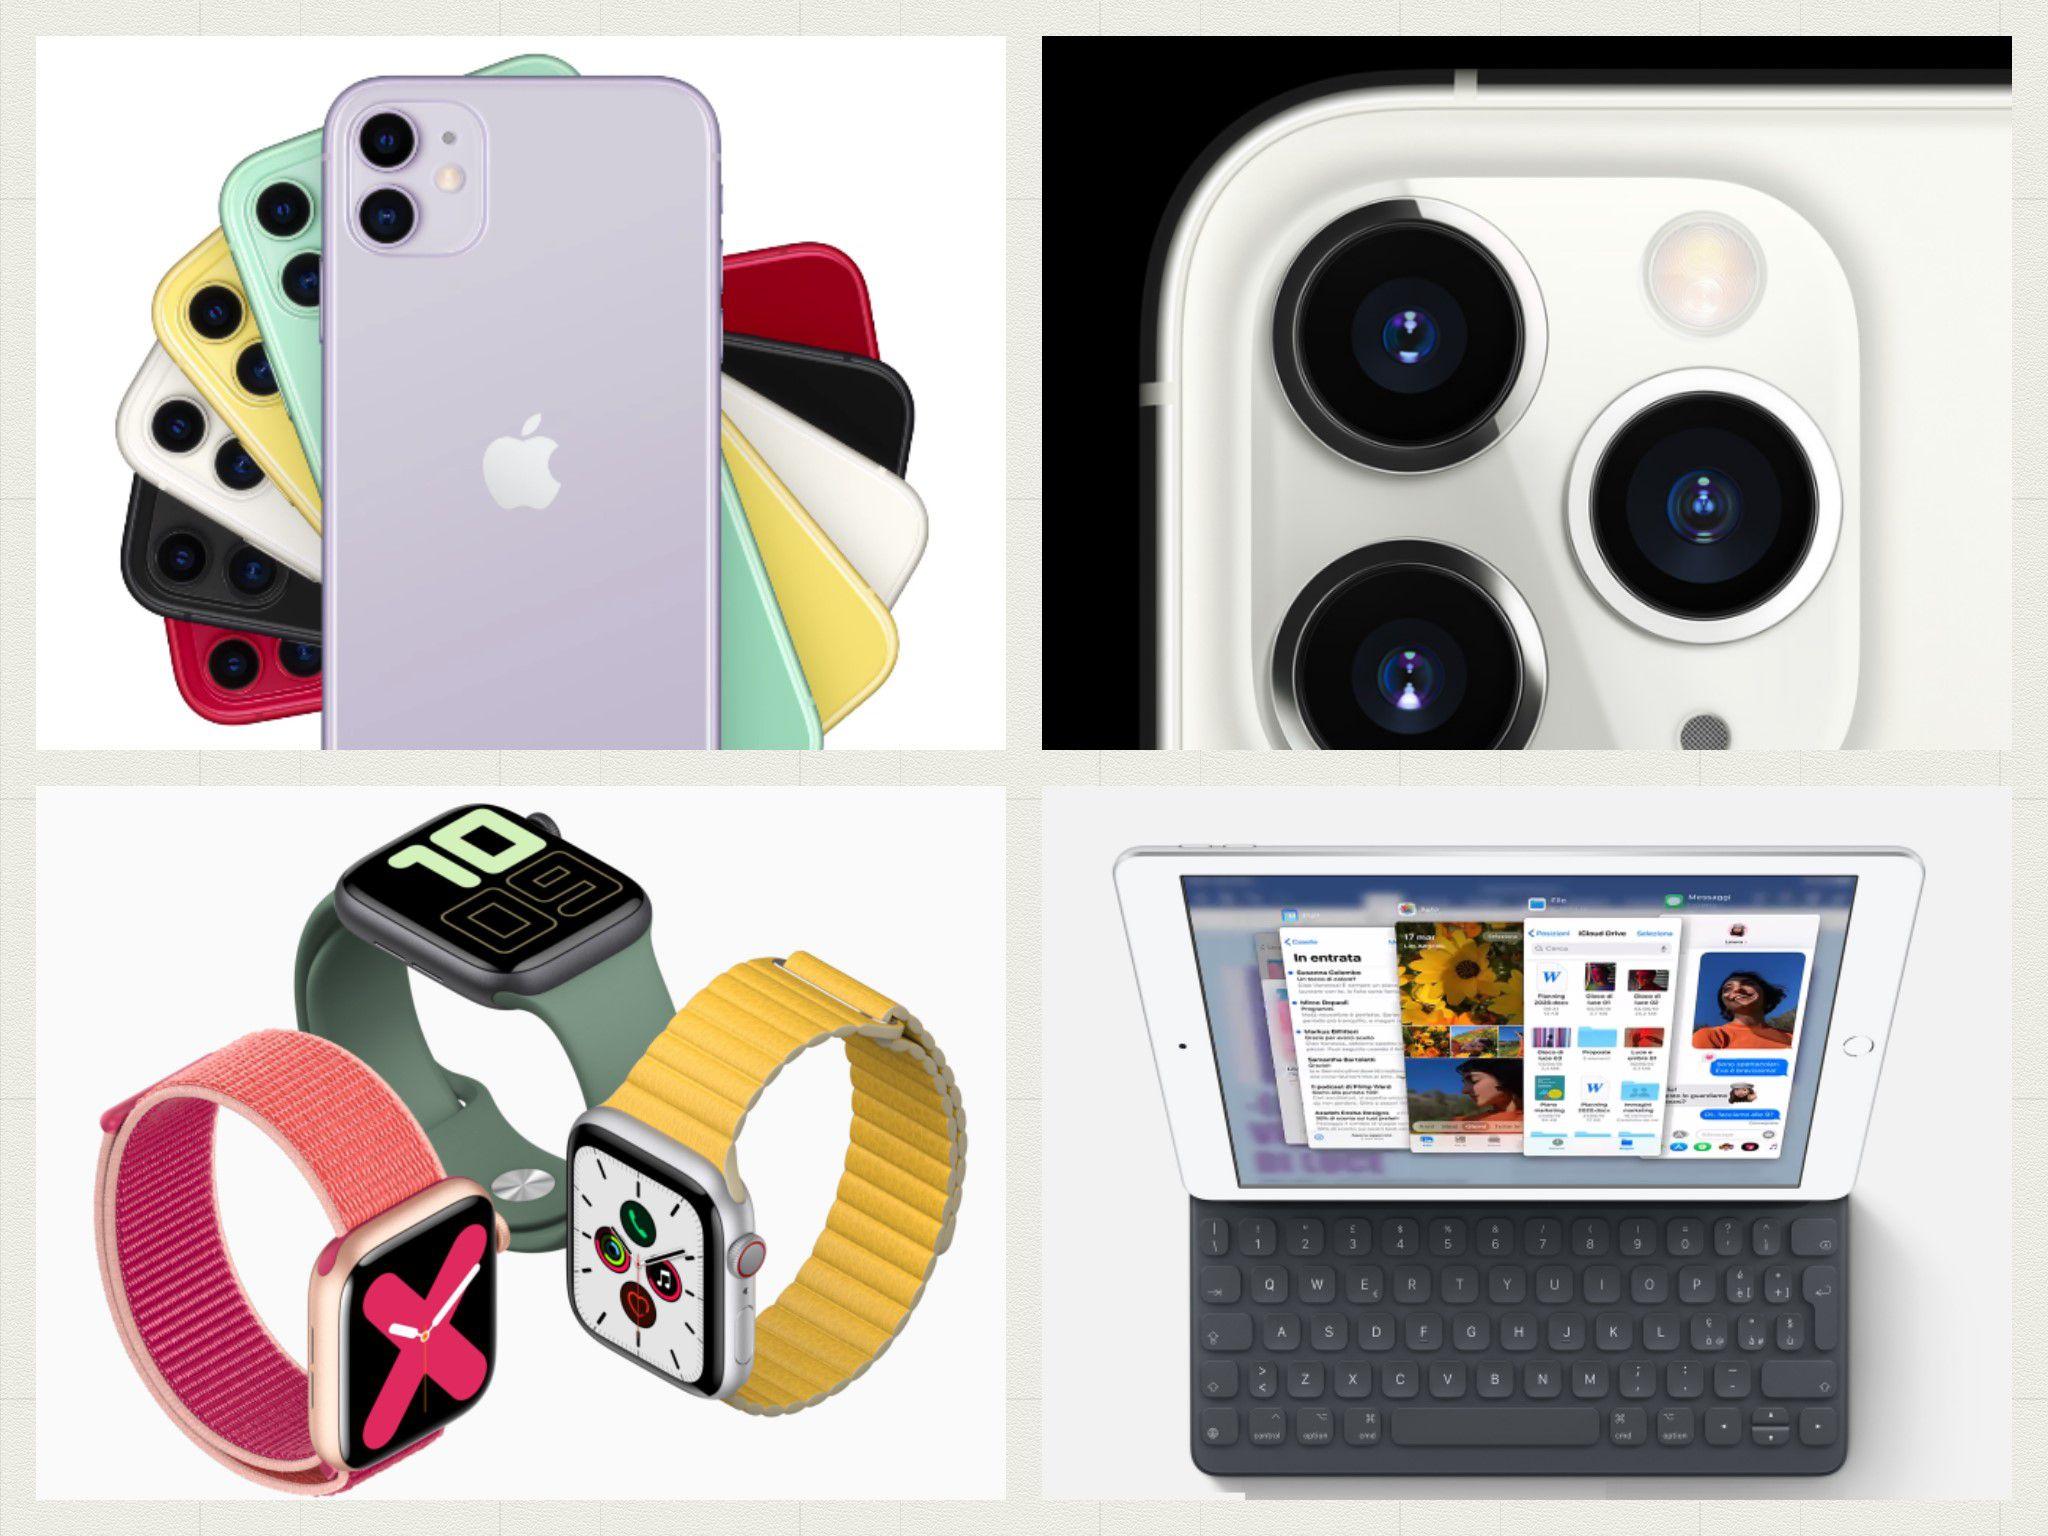 Apple Event: presentati i nuovi iPhone 11, iPhone 11 Pro ed iPhone 11 Pro Max, l'iPad 7 e l'Apple Watch Series 5